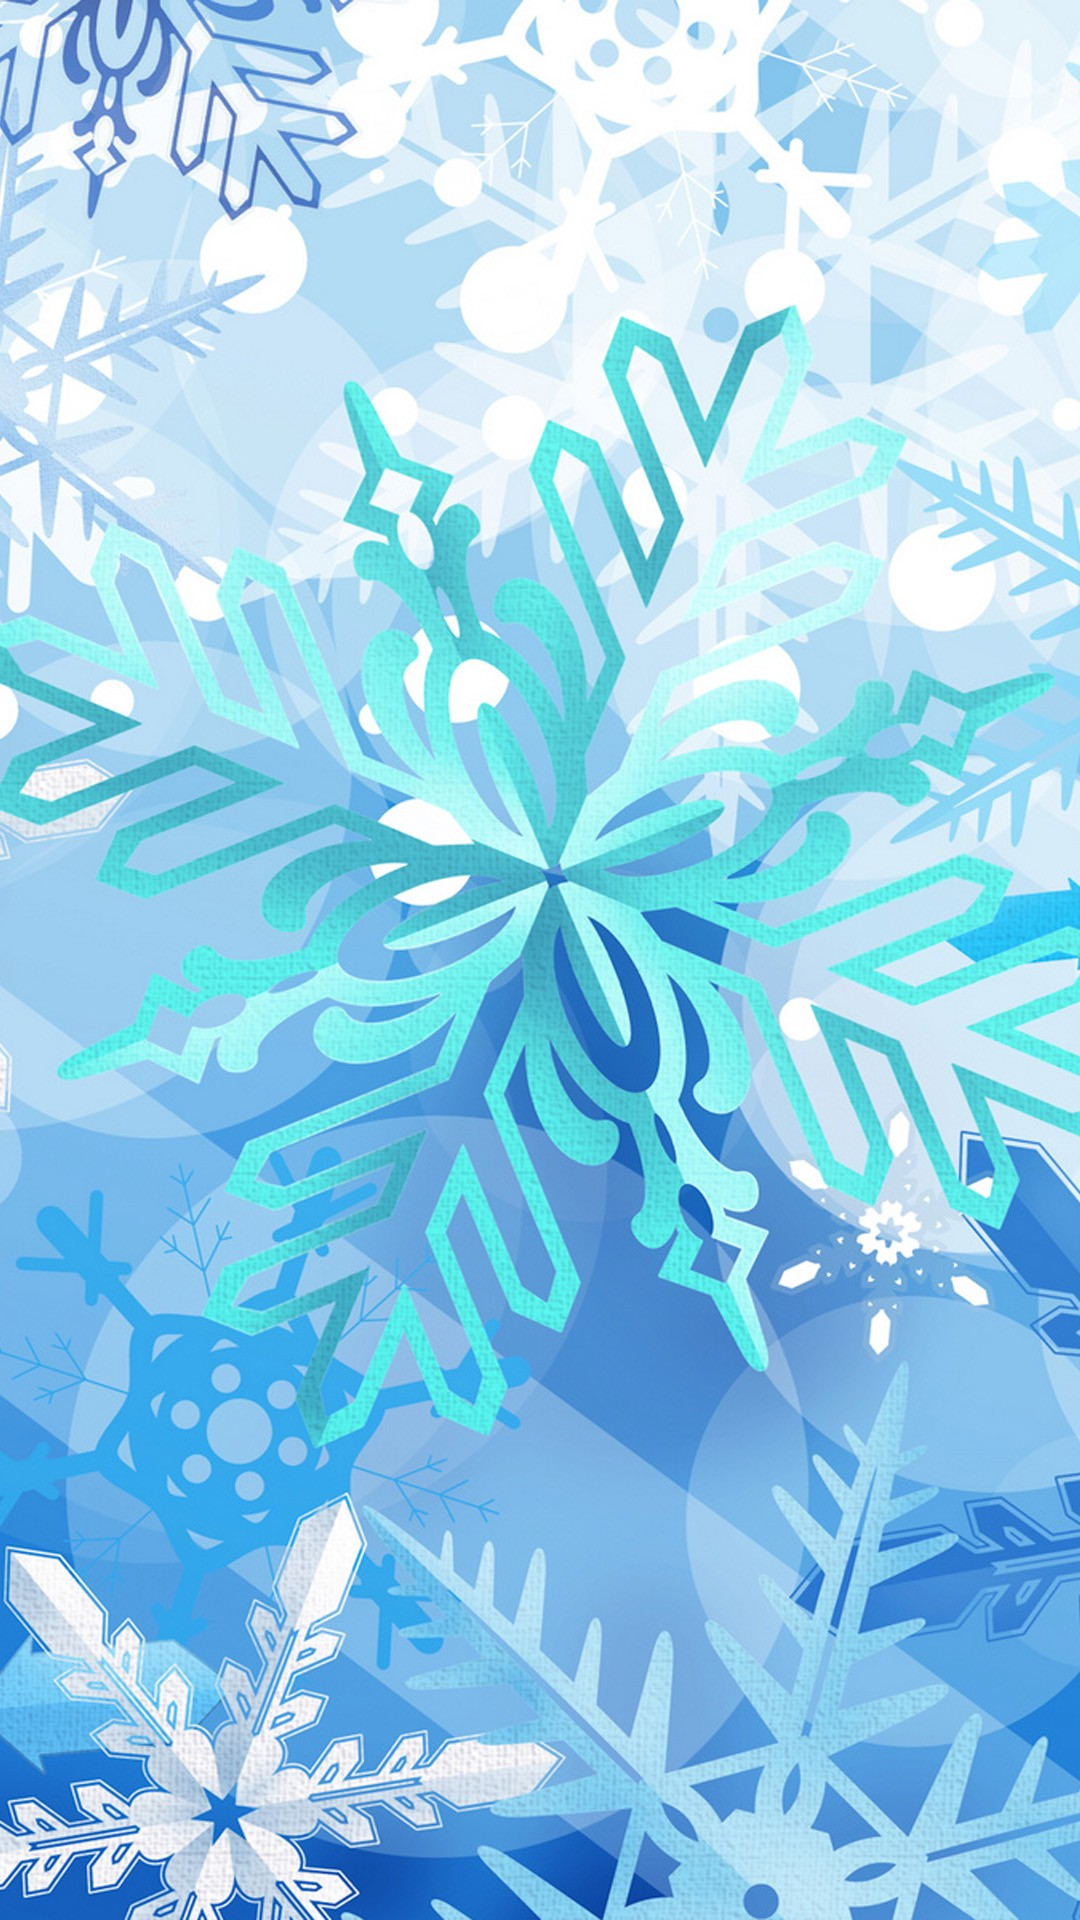 Snow Crystal Iphone Wallpaper